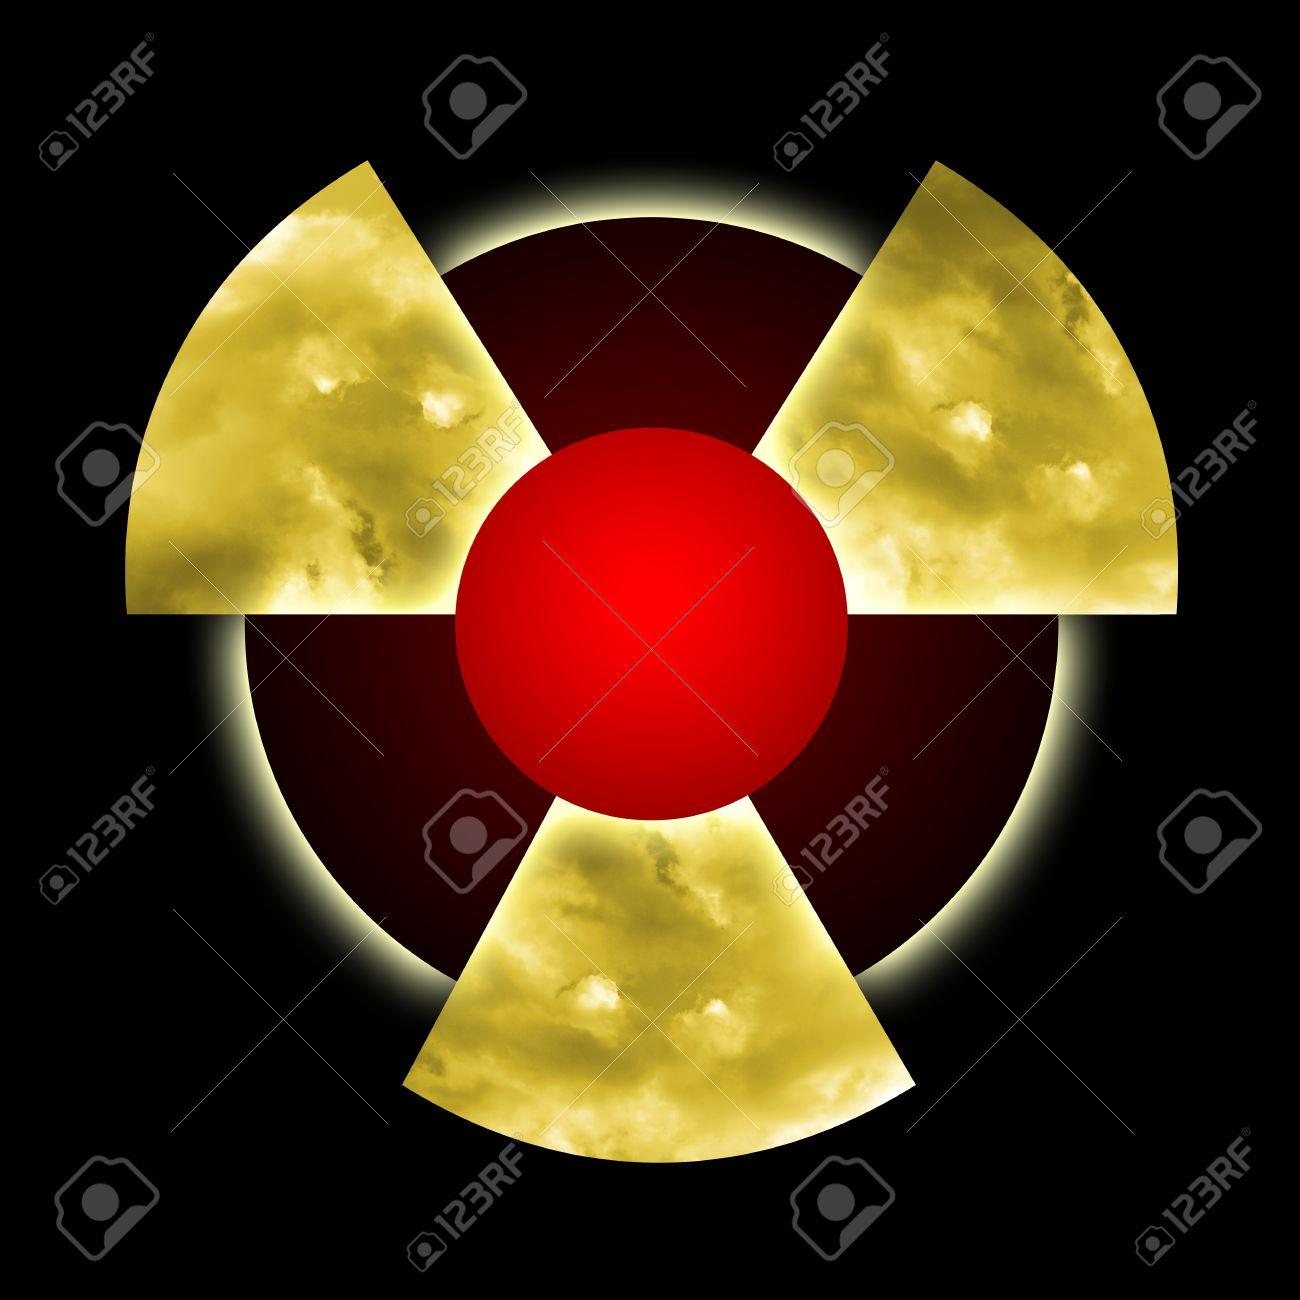 Radioactive pollution atomic dust and smoke inside radioactive radioactive pollution atomic dust and smoke inside radioactive symbol over black background stock photo buycottarizona